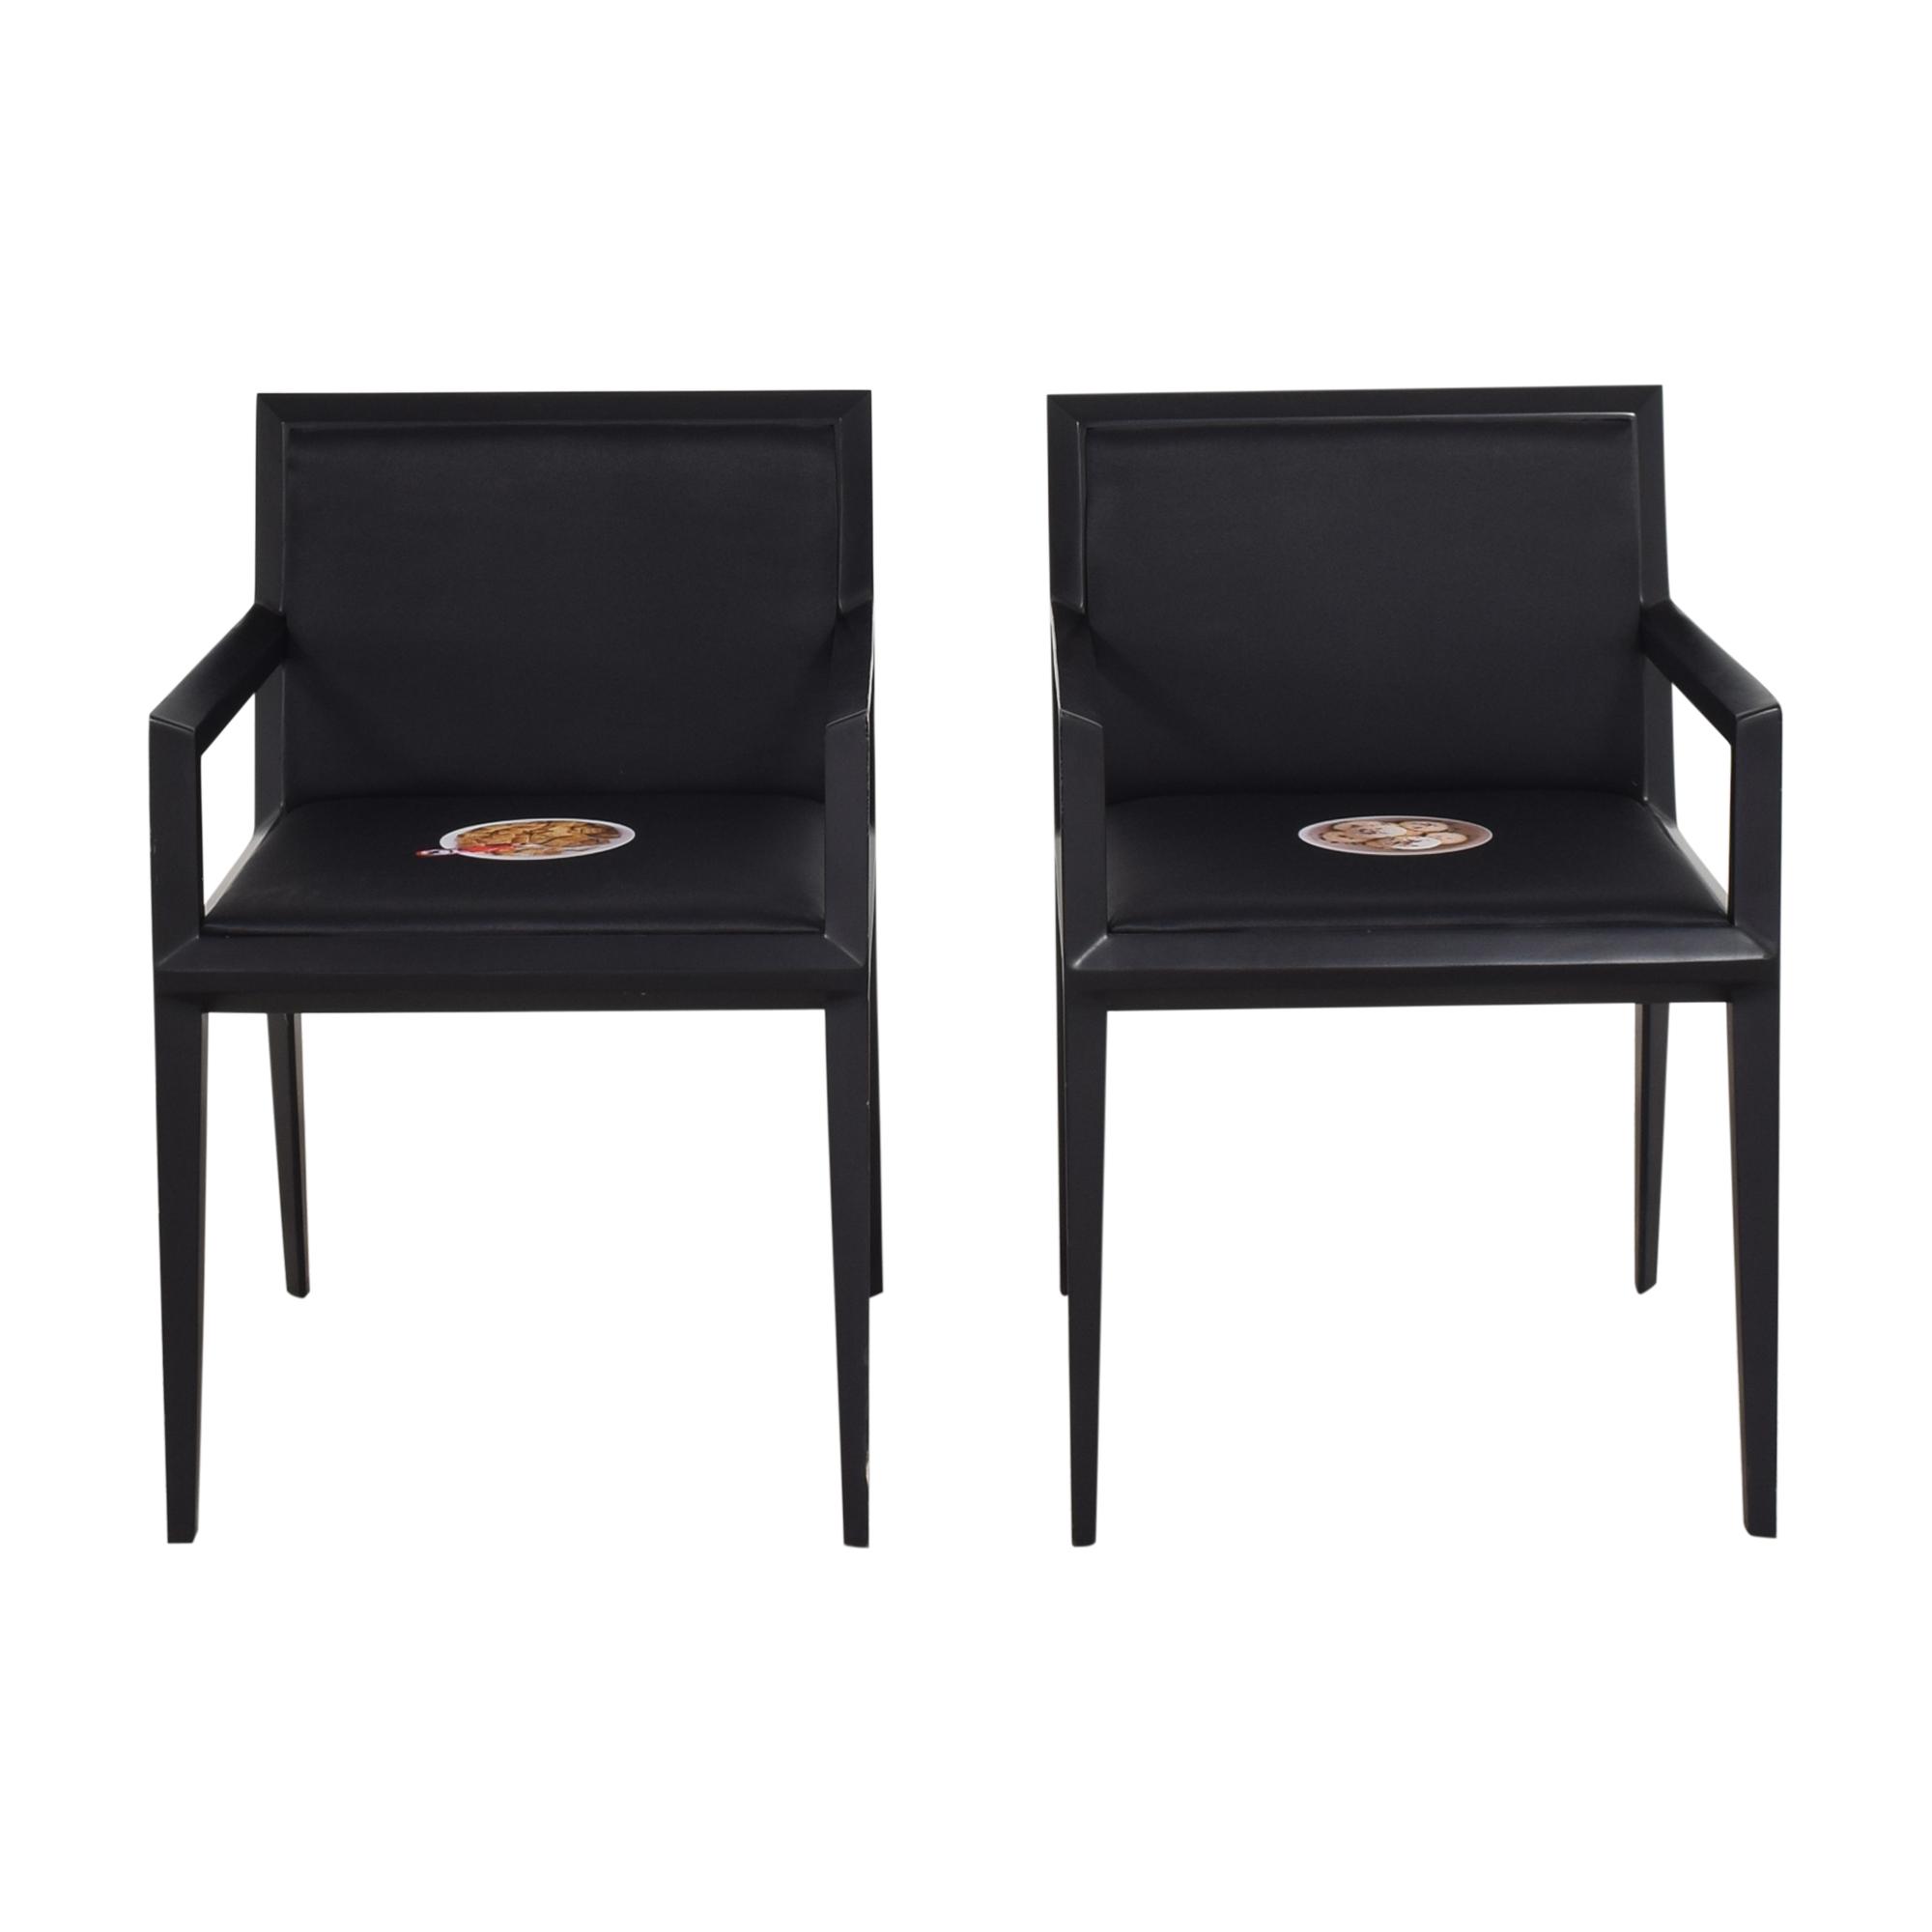 Bernhardt Bernhardt Custom Graphic Whisper Arm Chairs on sale